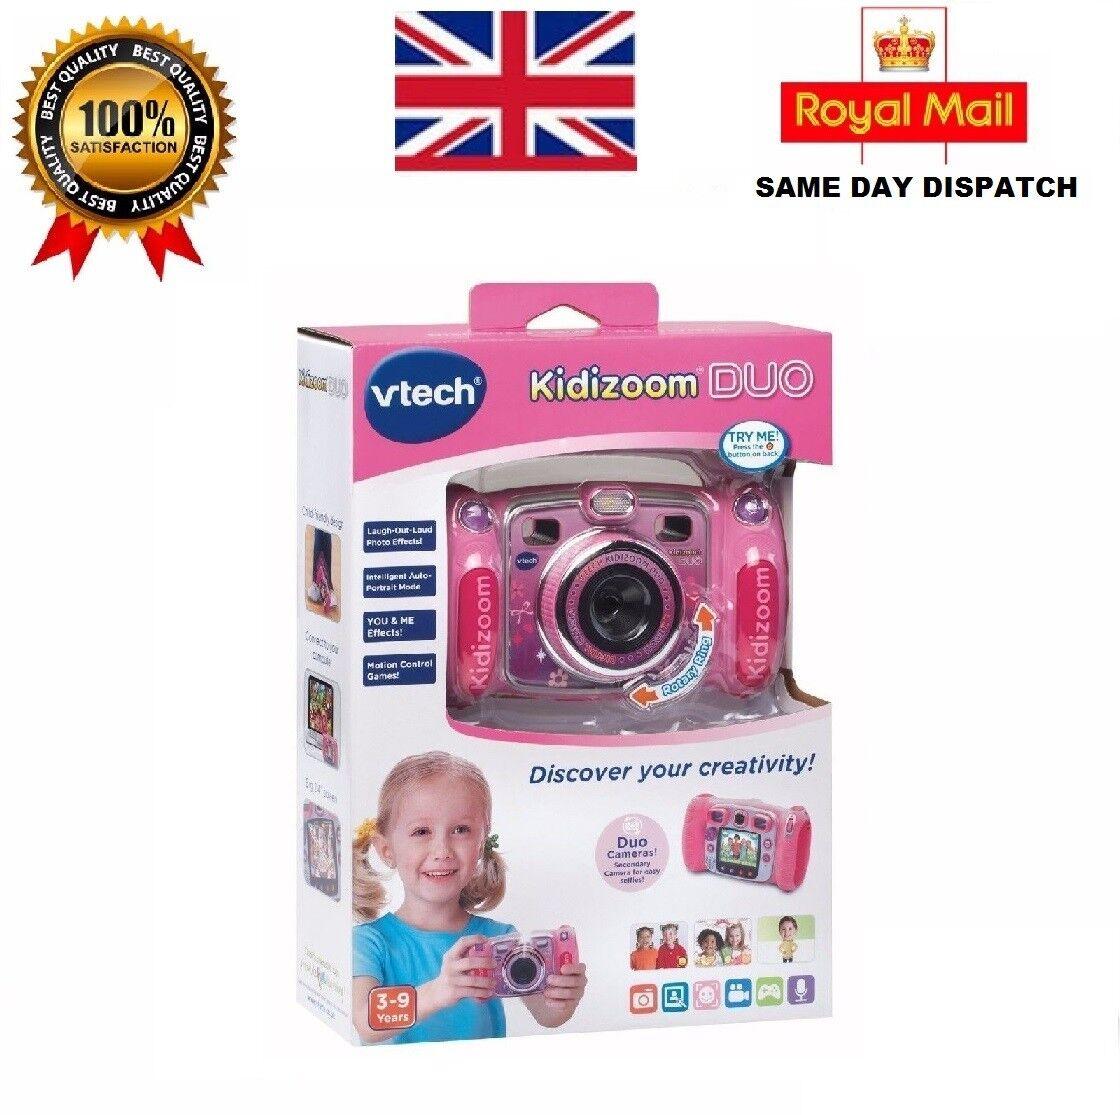 VTECH KIDIZOOM DUO 5.0 KIDS DIGITAL CAMERA PINK + FREE 32GB SD CARD